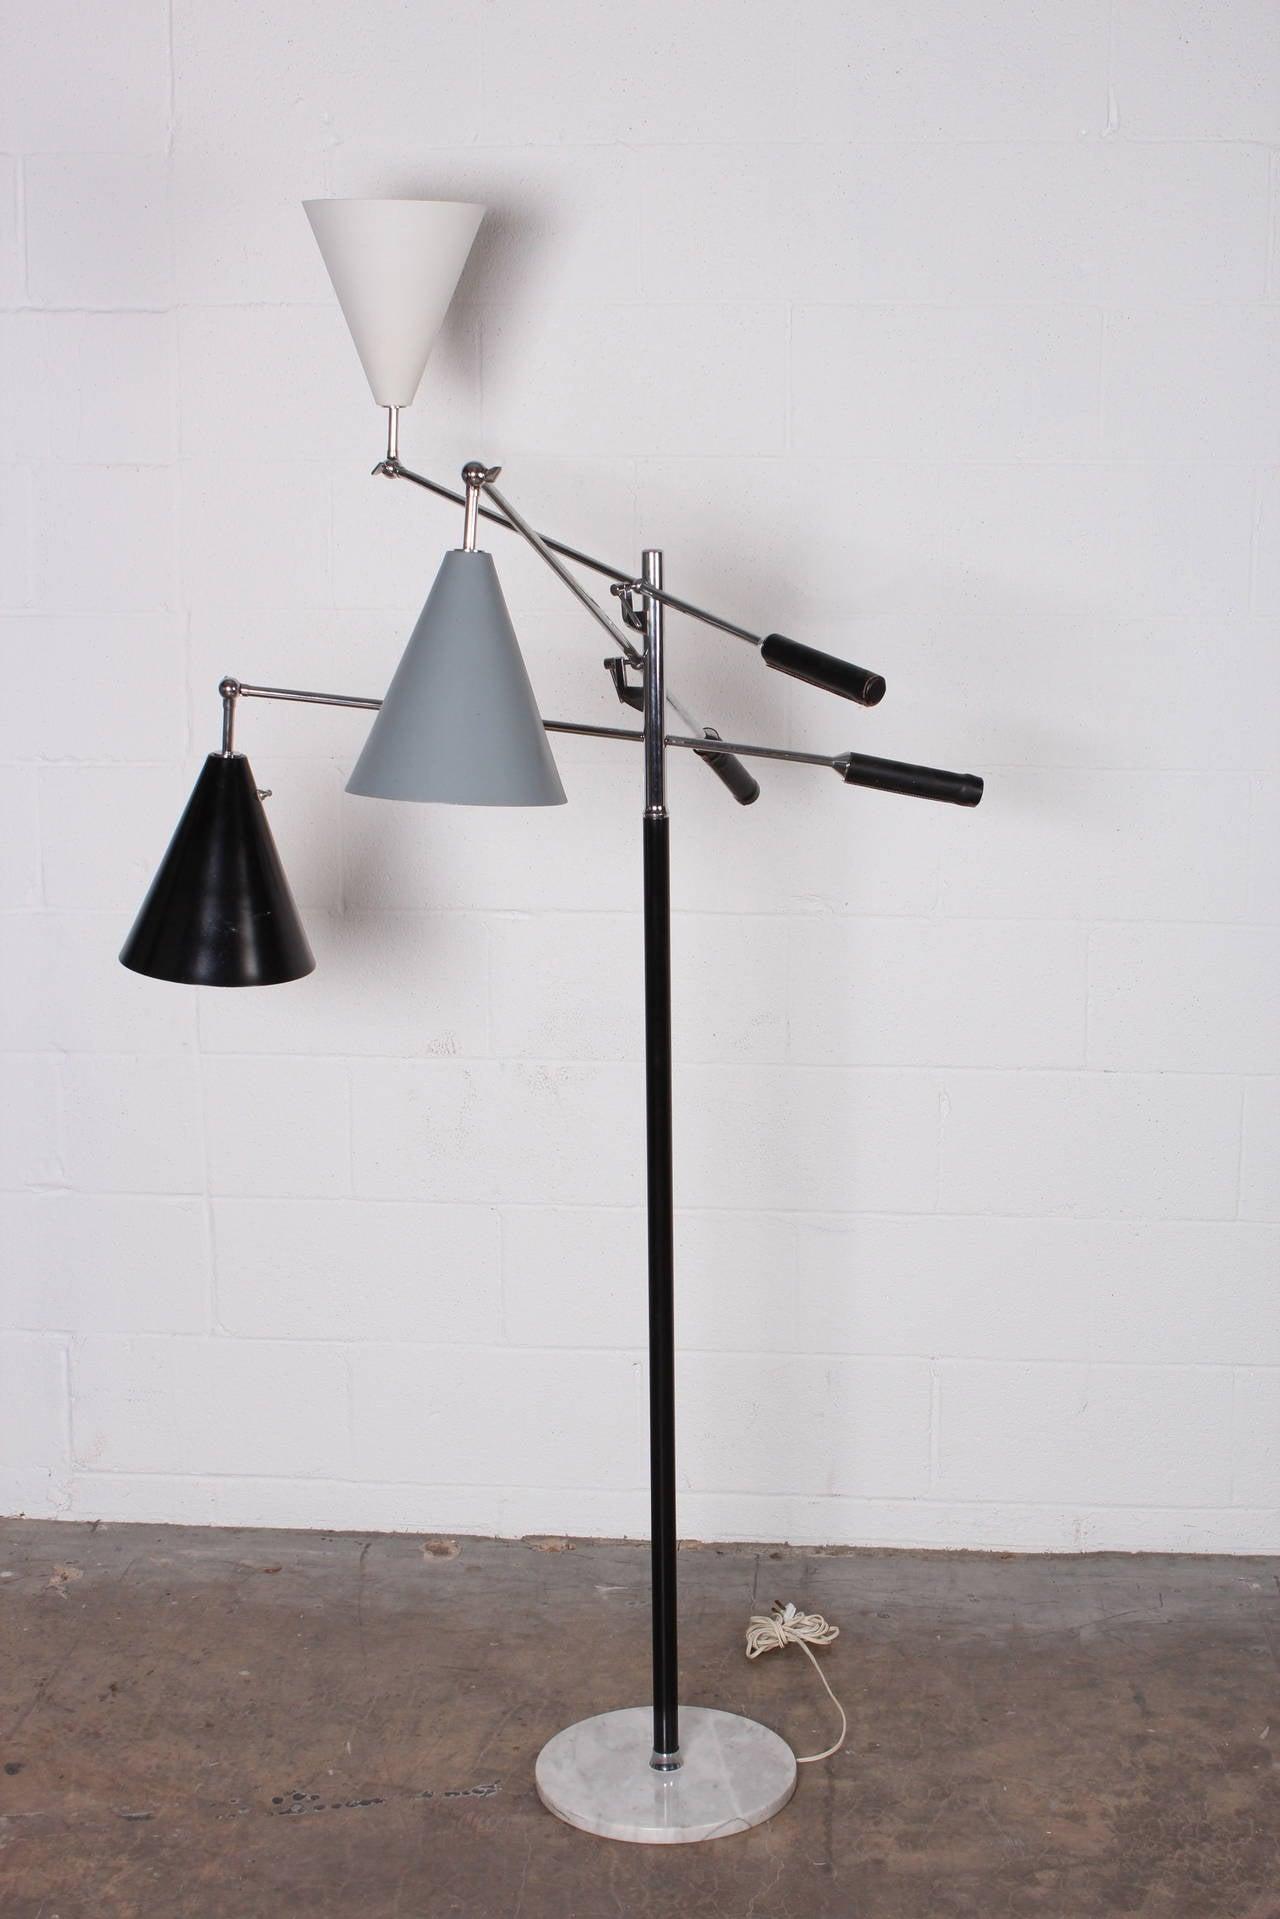 Triennale lamp by arredoluce at 1stdibs for Arredo luce